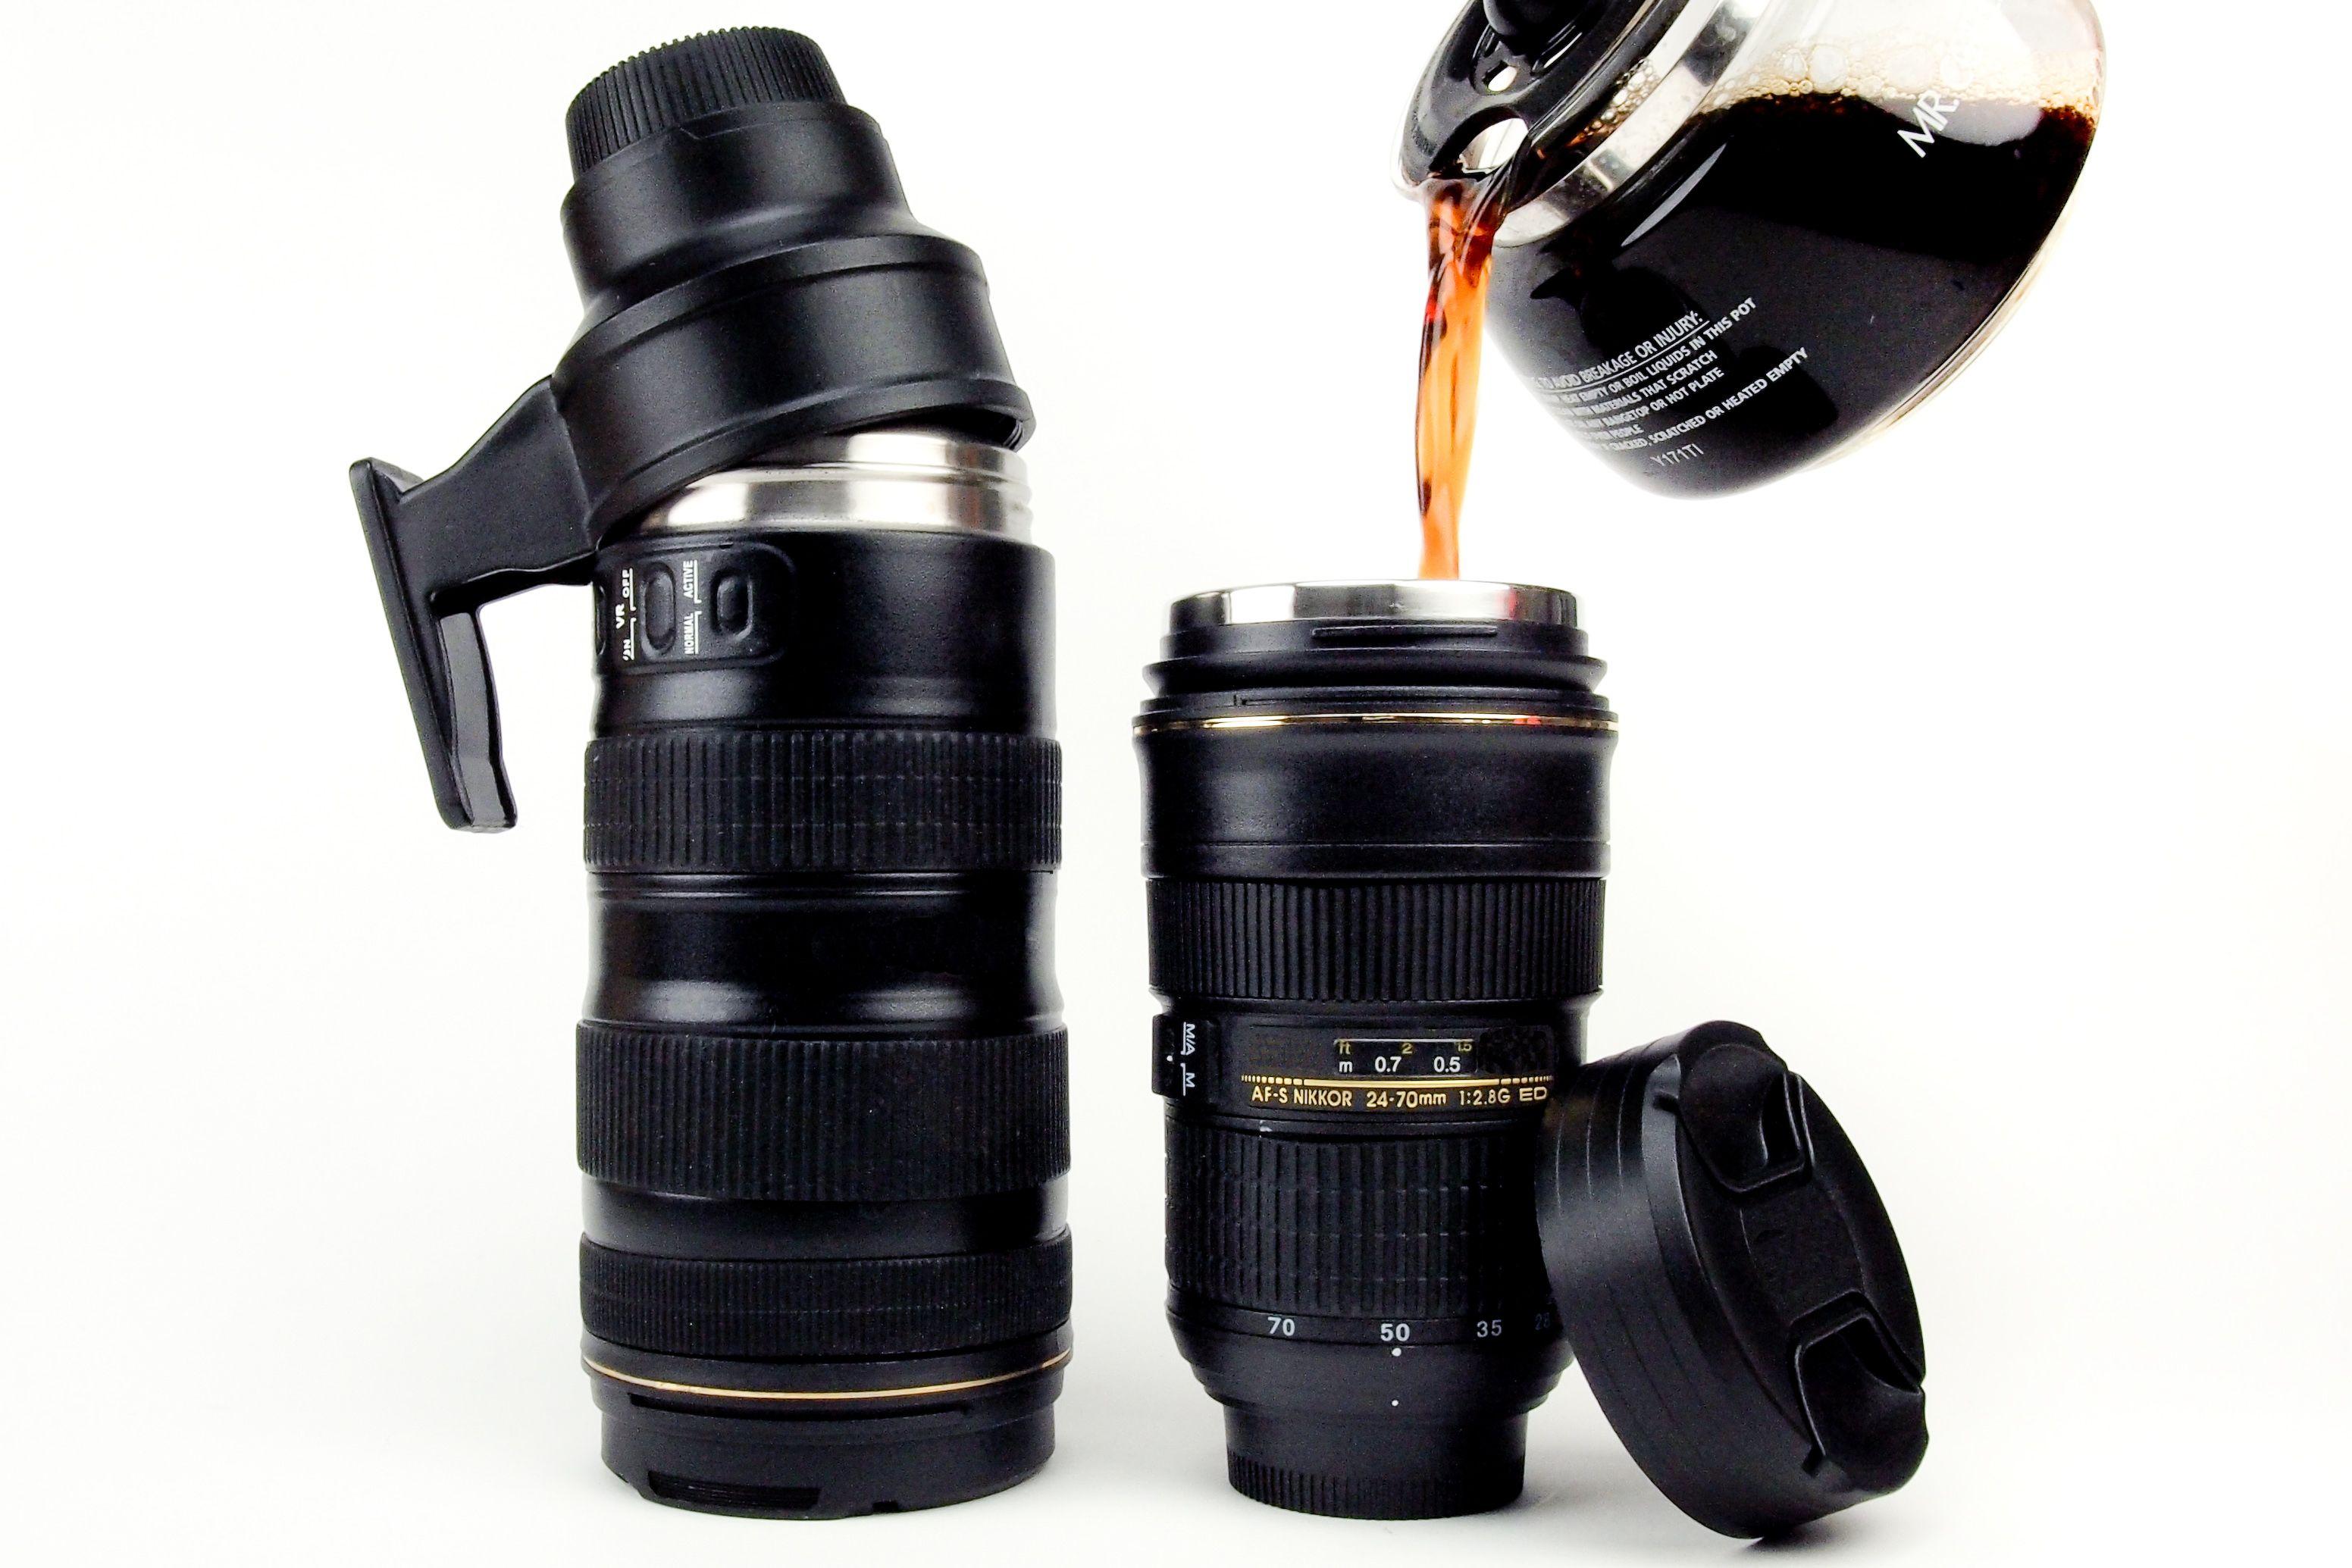 Nikon mugs - termo en forma de objetivo Nikkor. Genial idea.